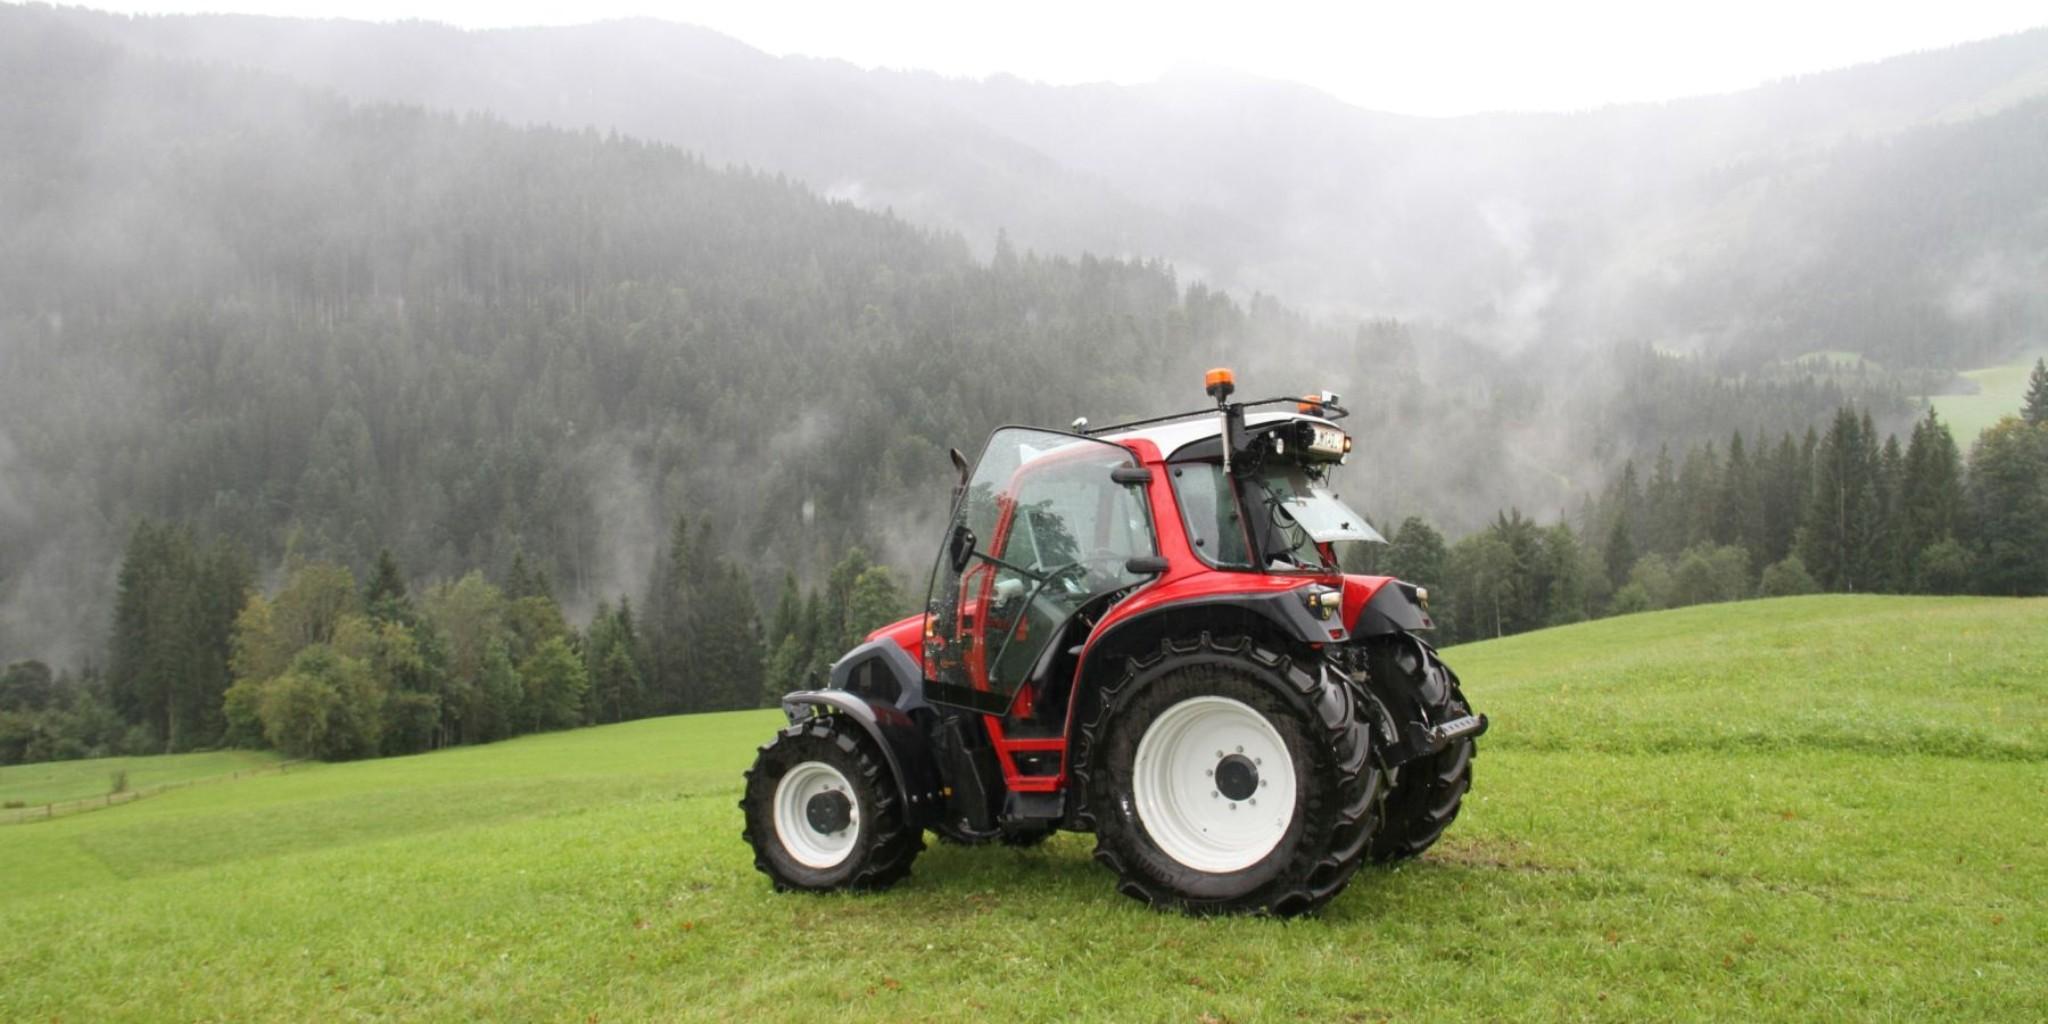 In Focus: Farming 4 0 - ZF Friedrichshafen AG